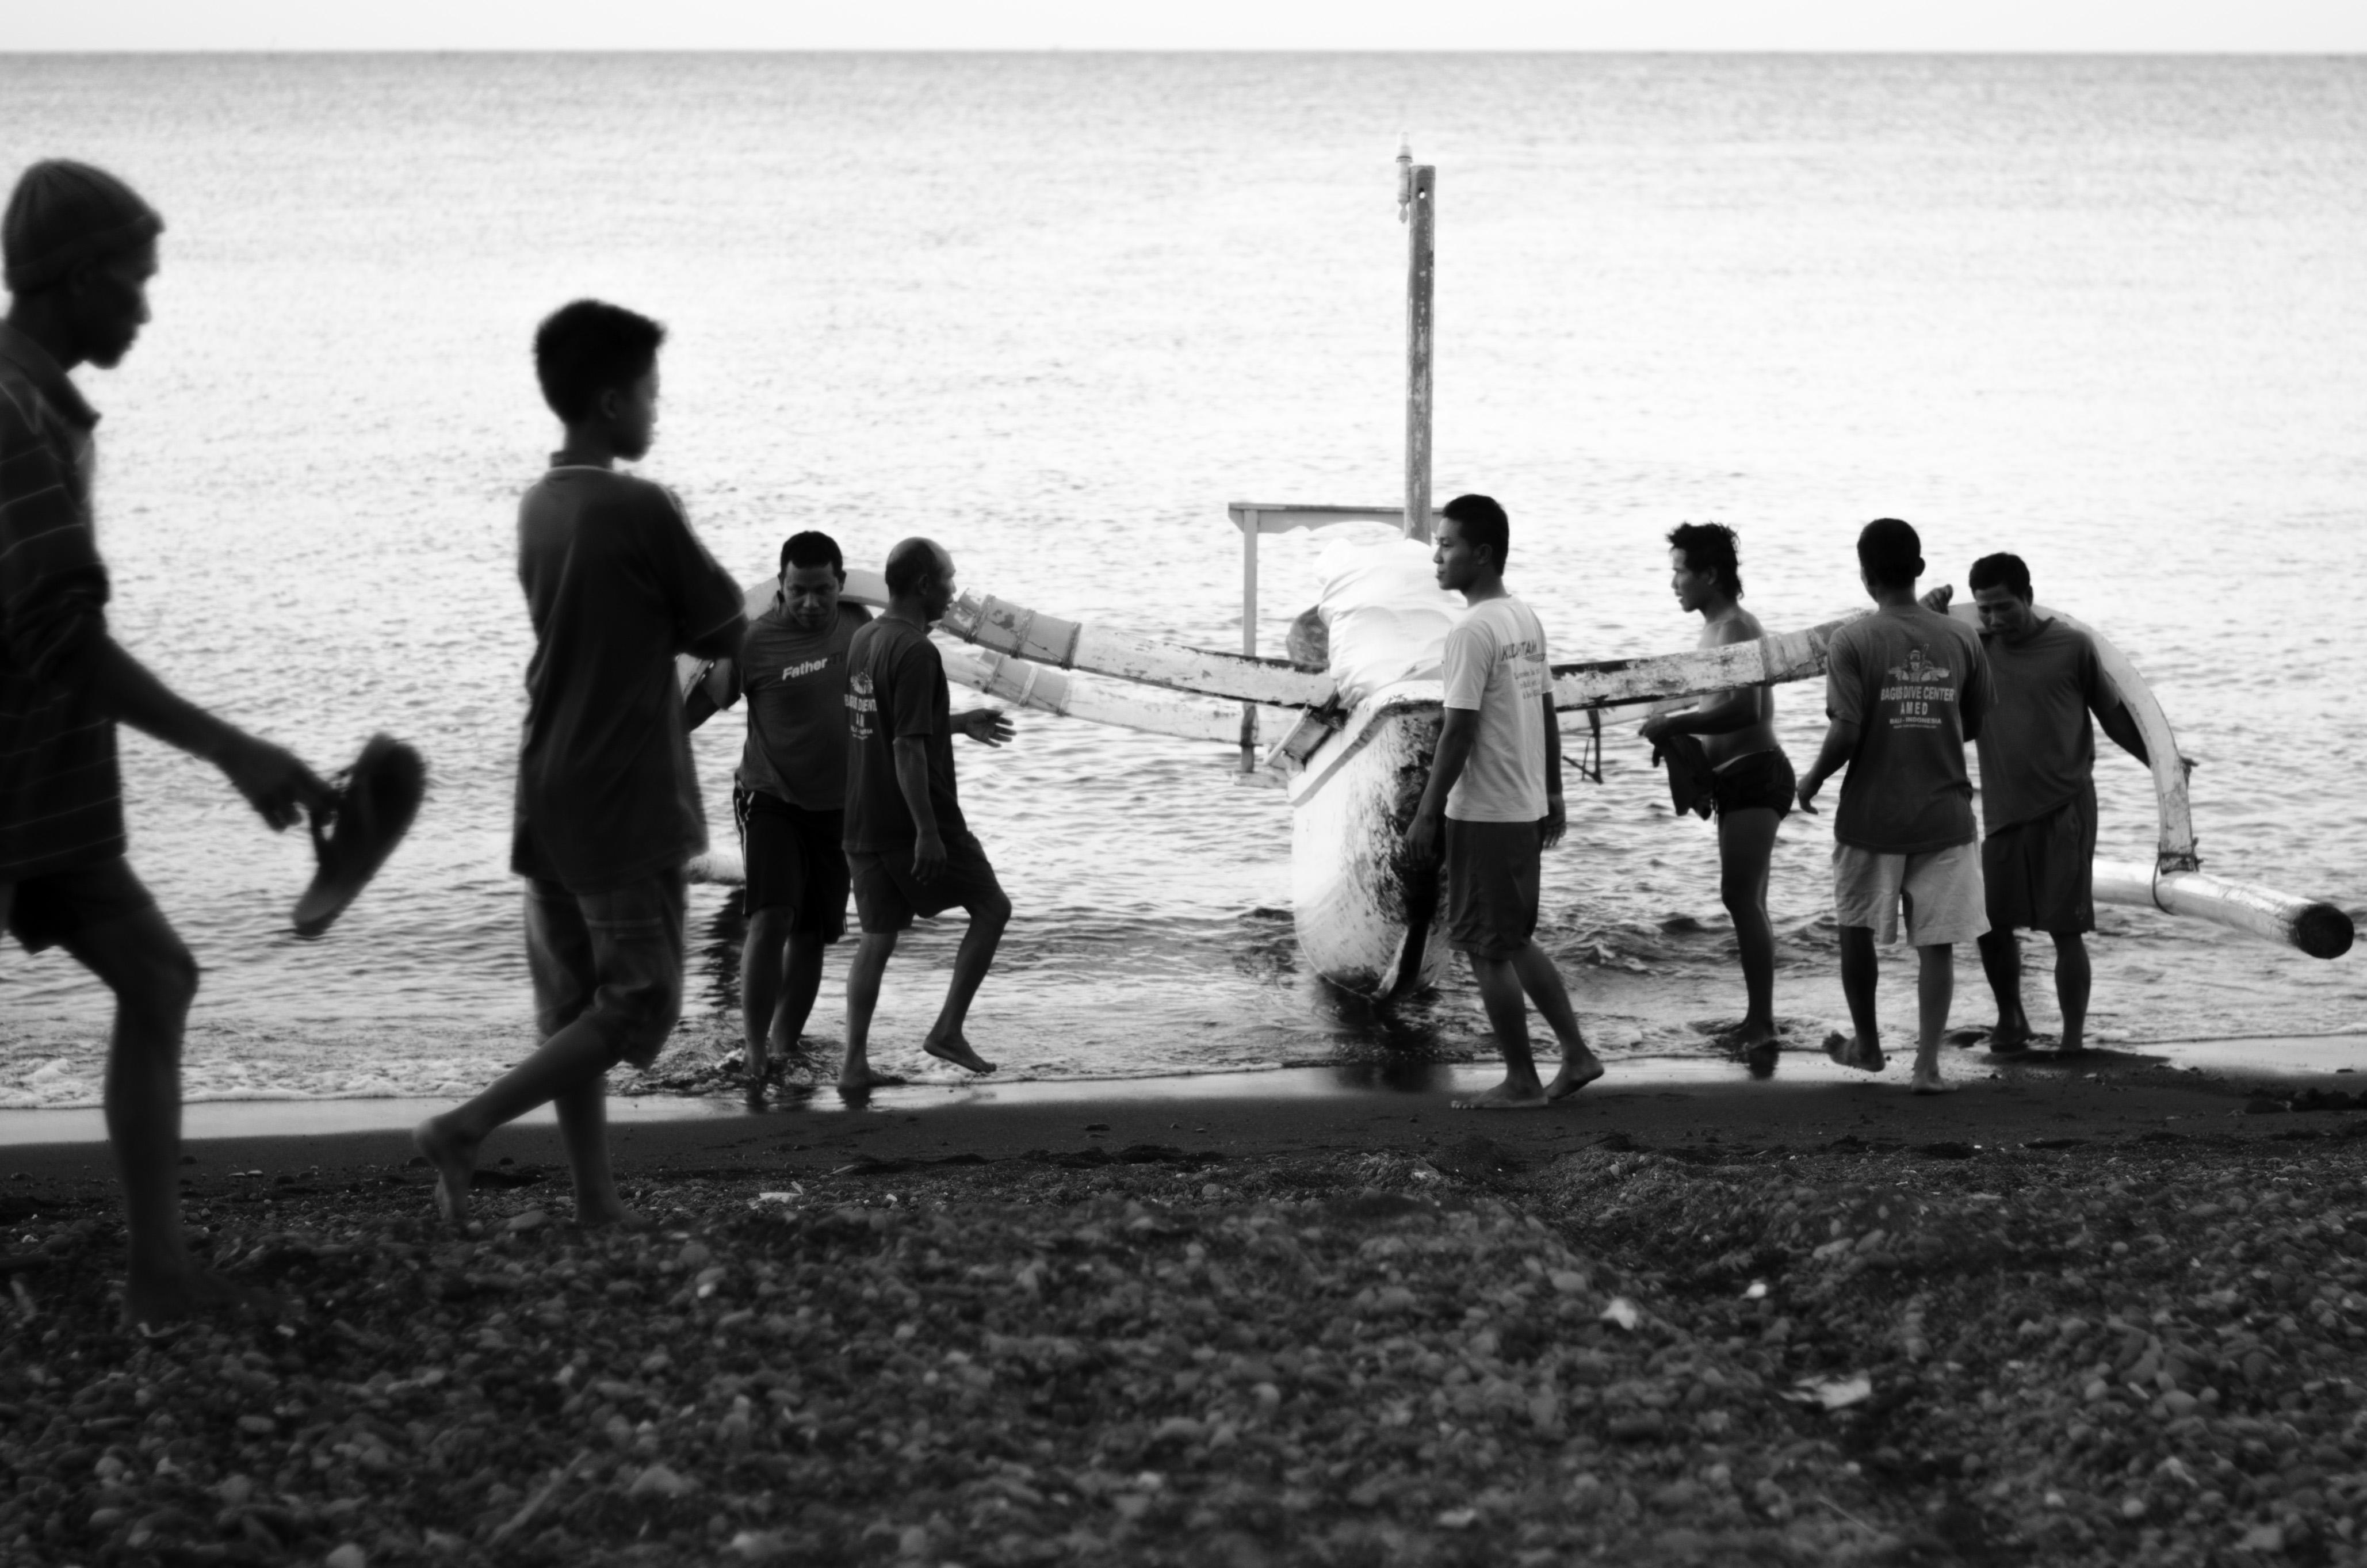 Bersama 2013 Bali